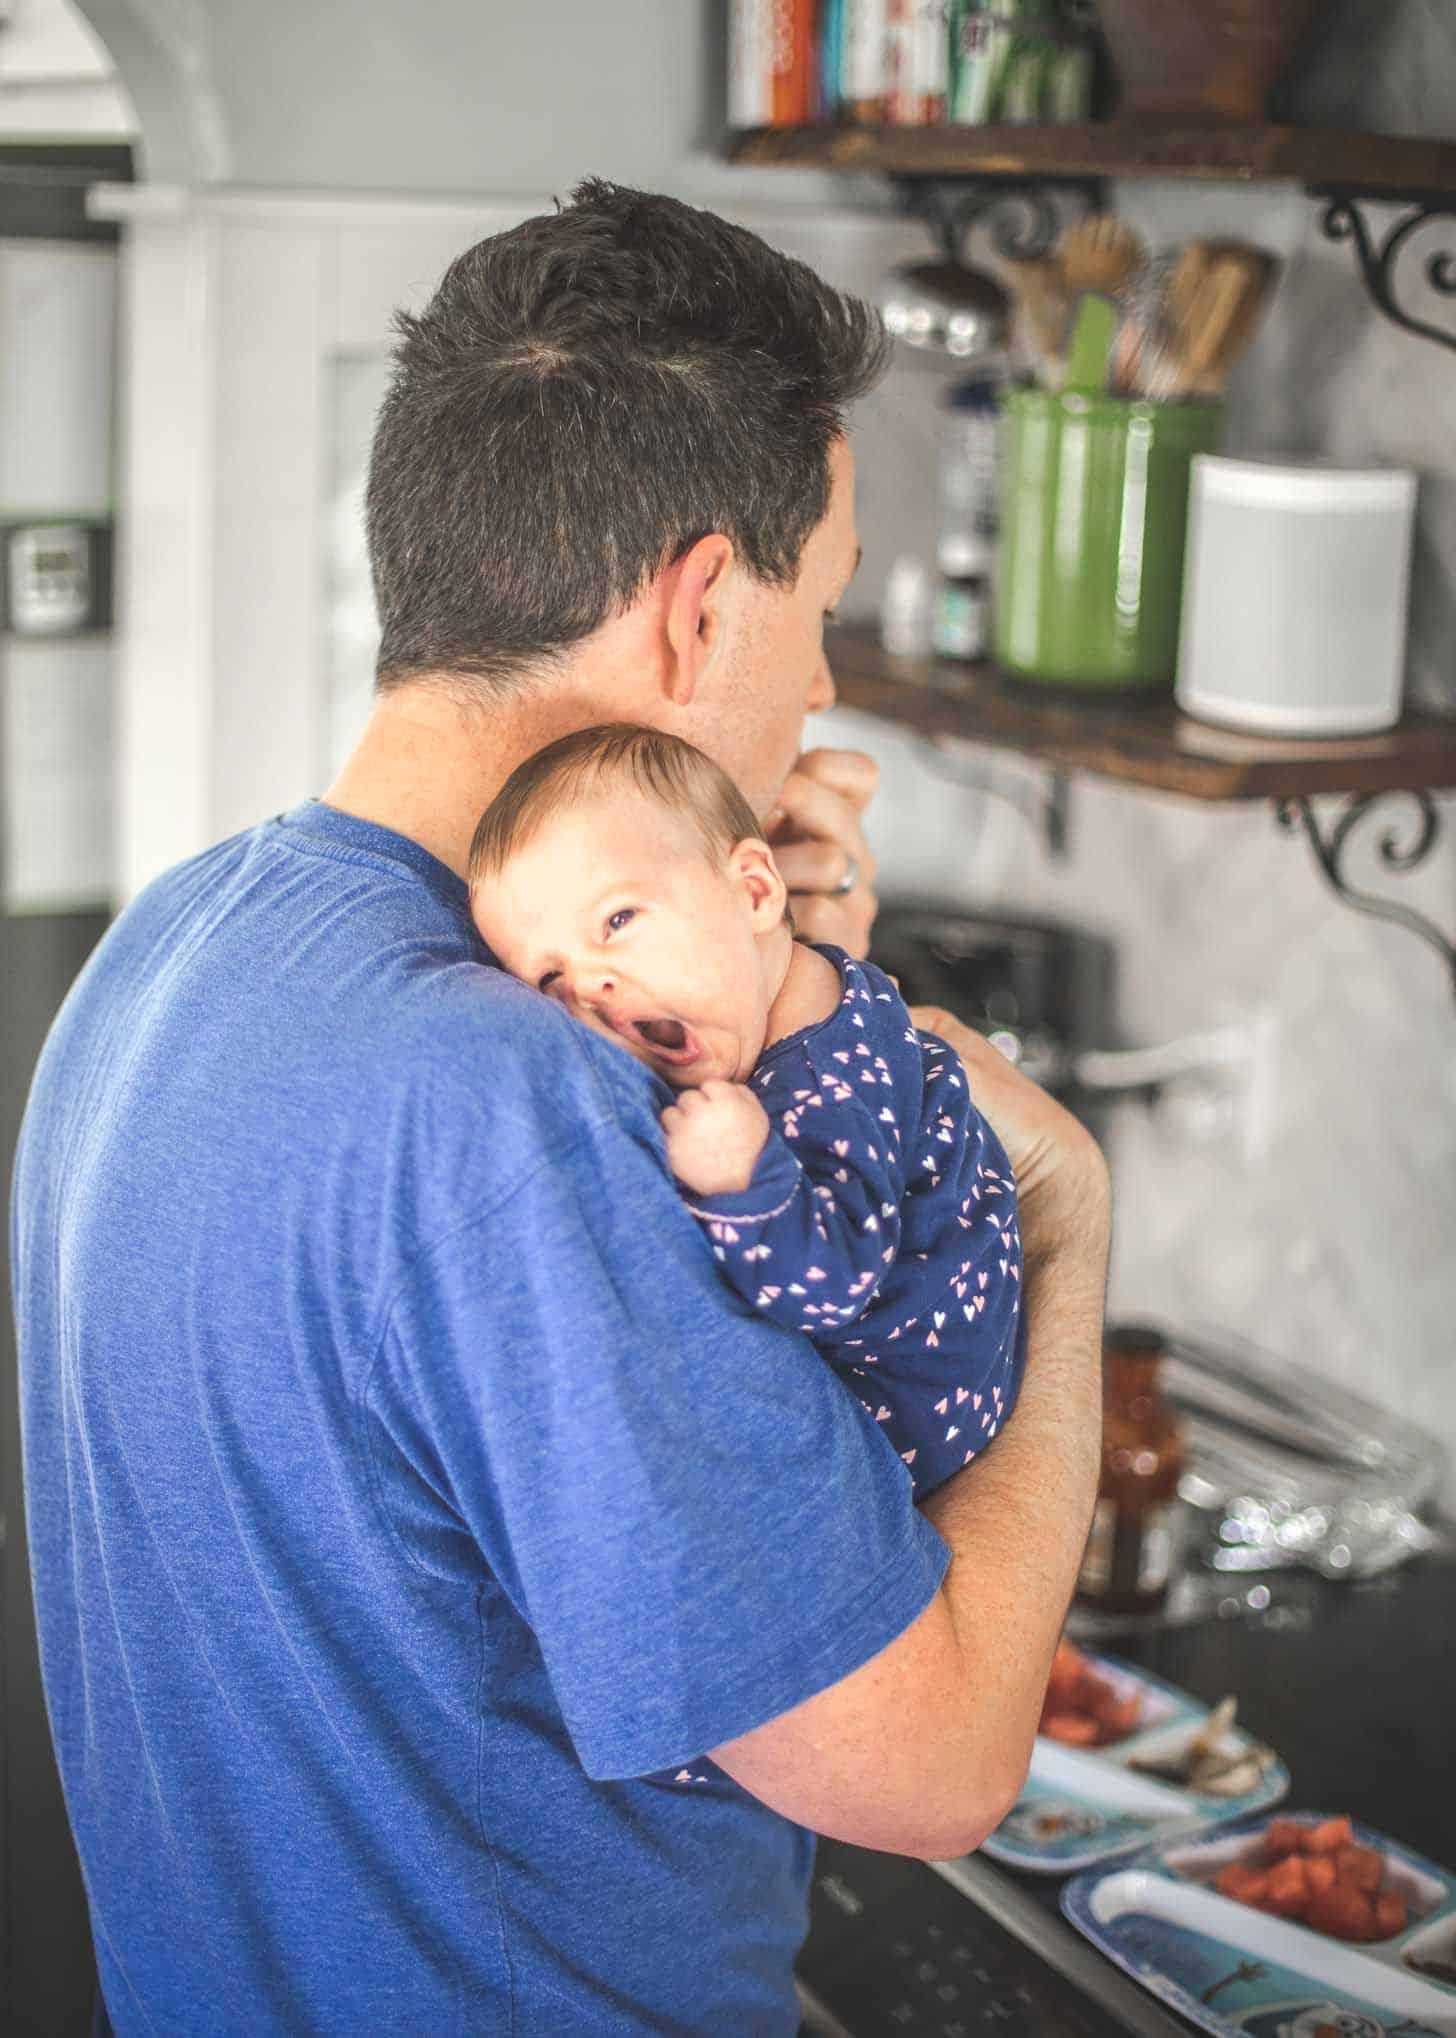 Frank holding baby June